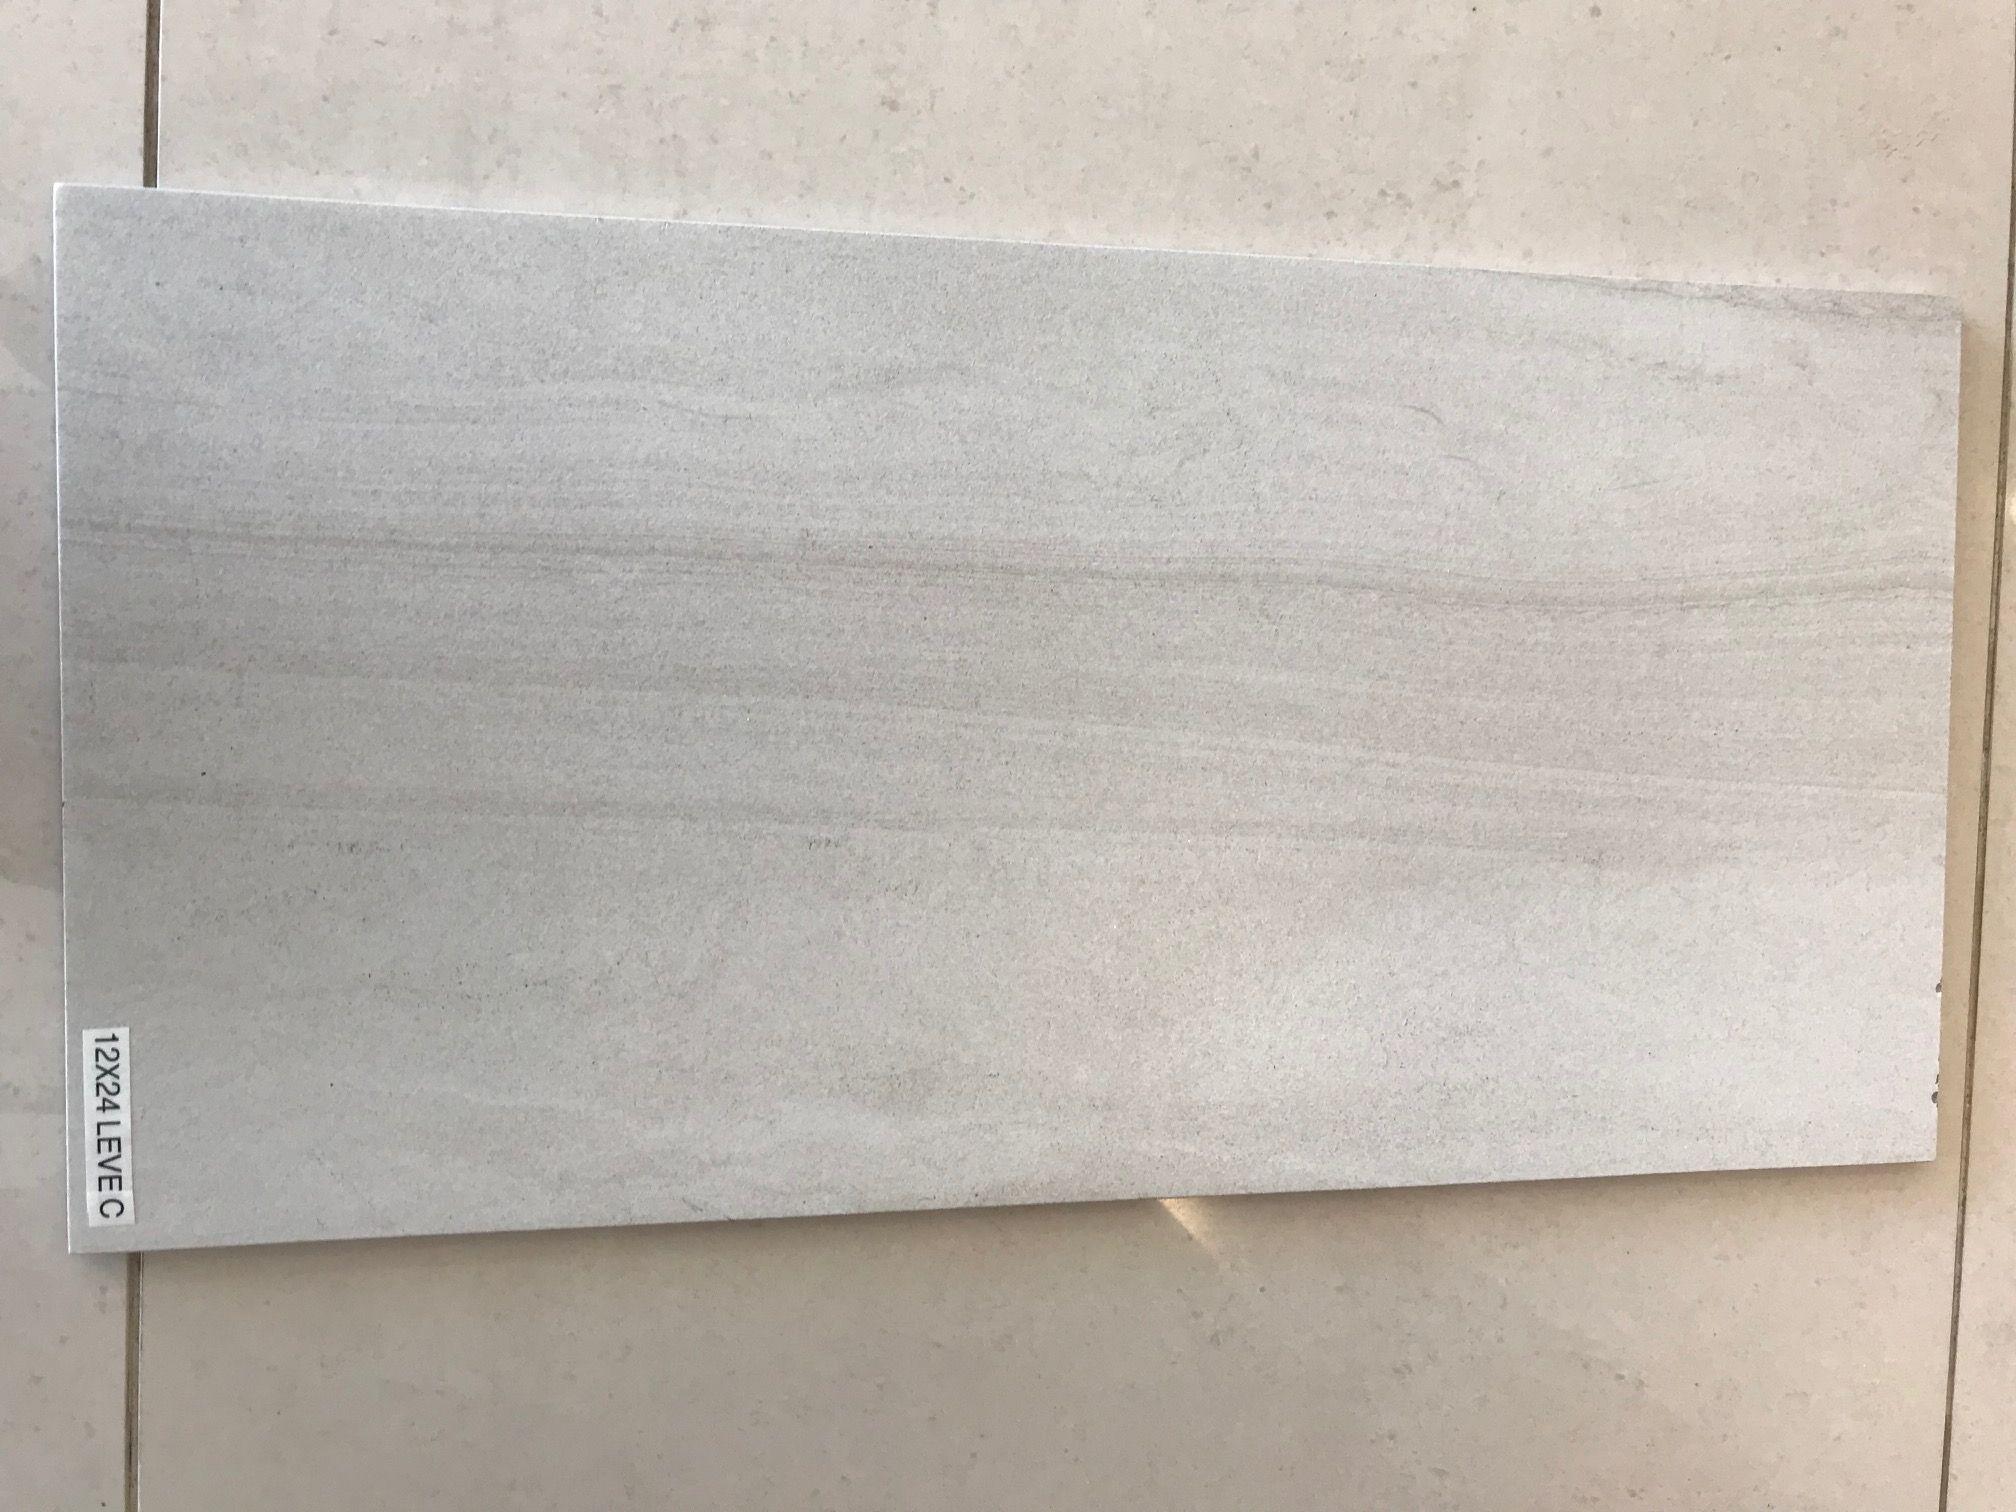 Bath Floor Wall Tile Daltile AV X Maguire Pinterest - Daltile chattanooga